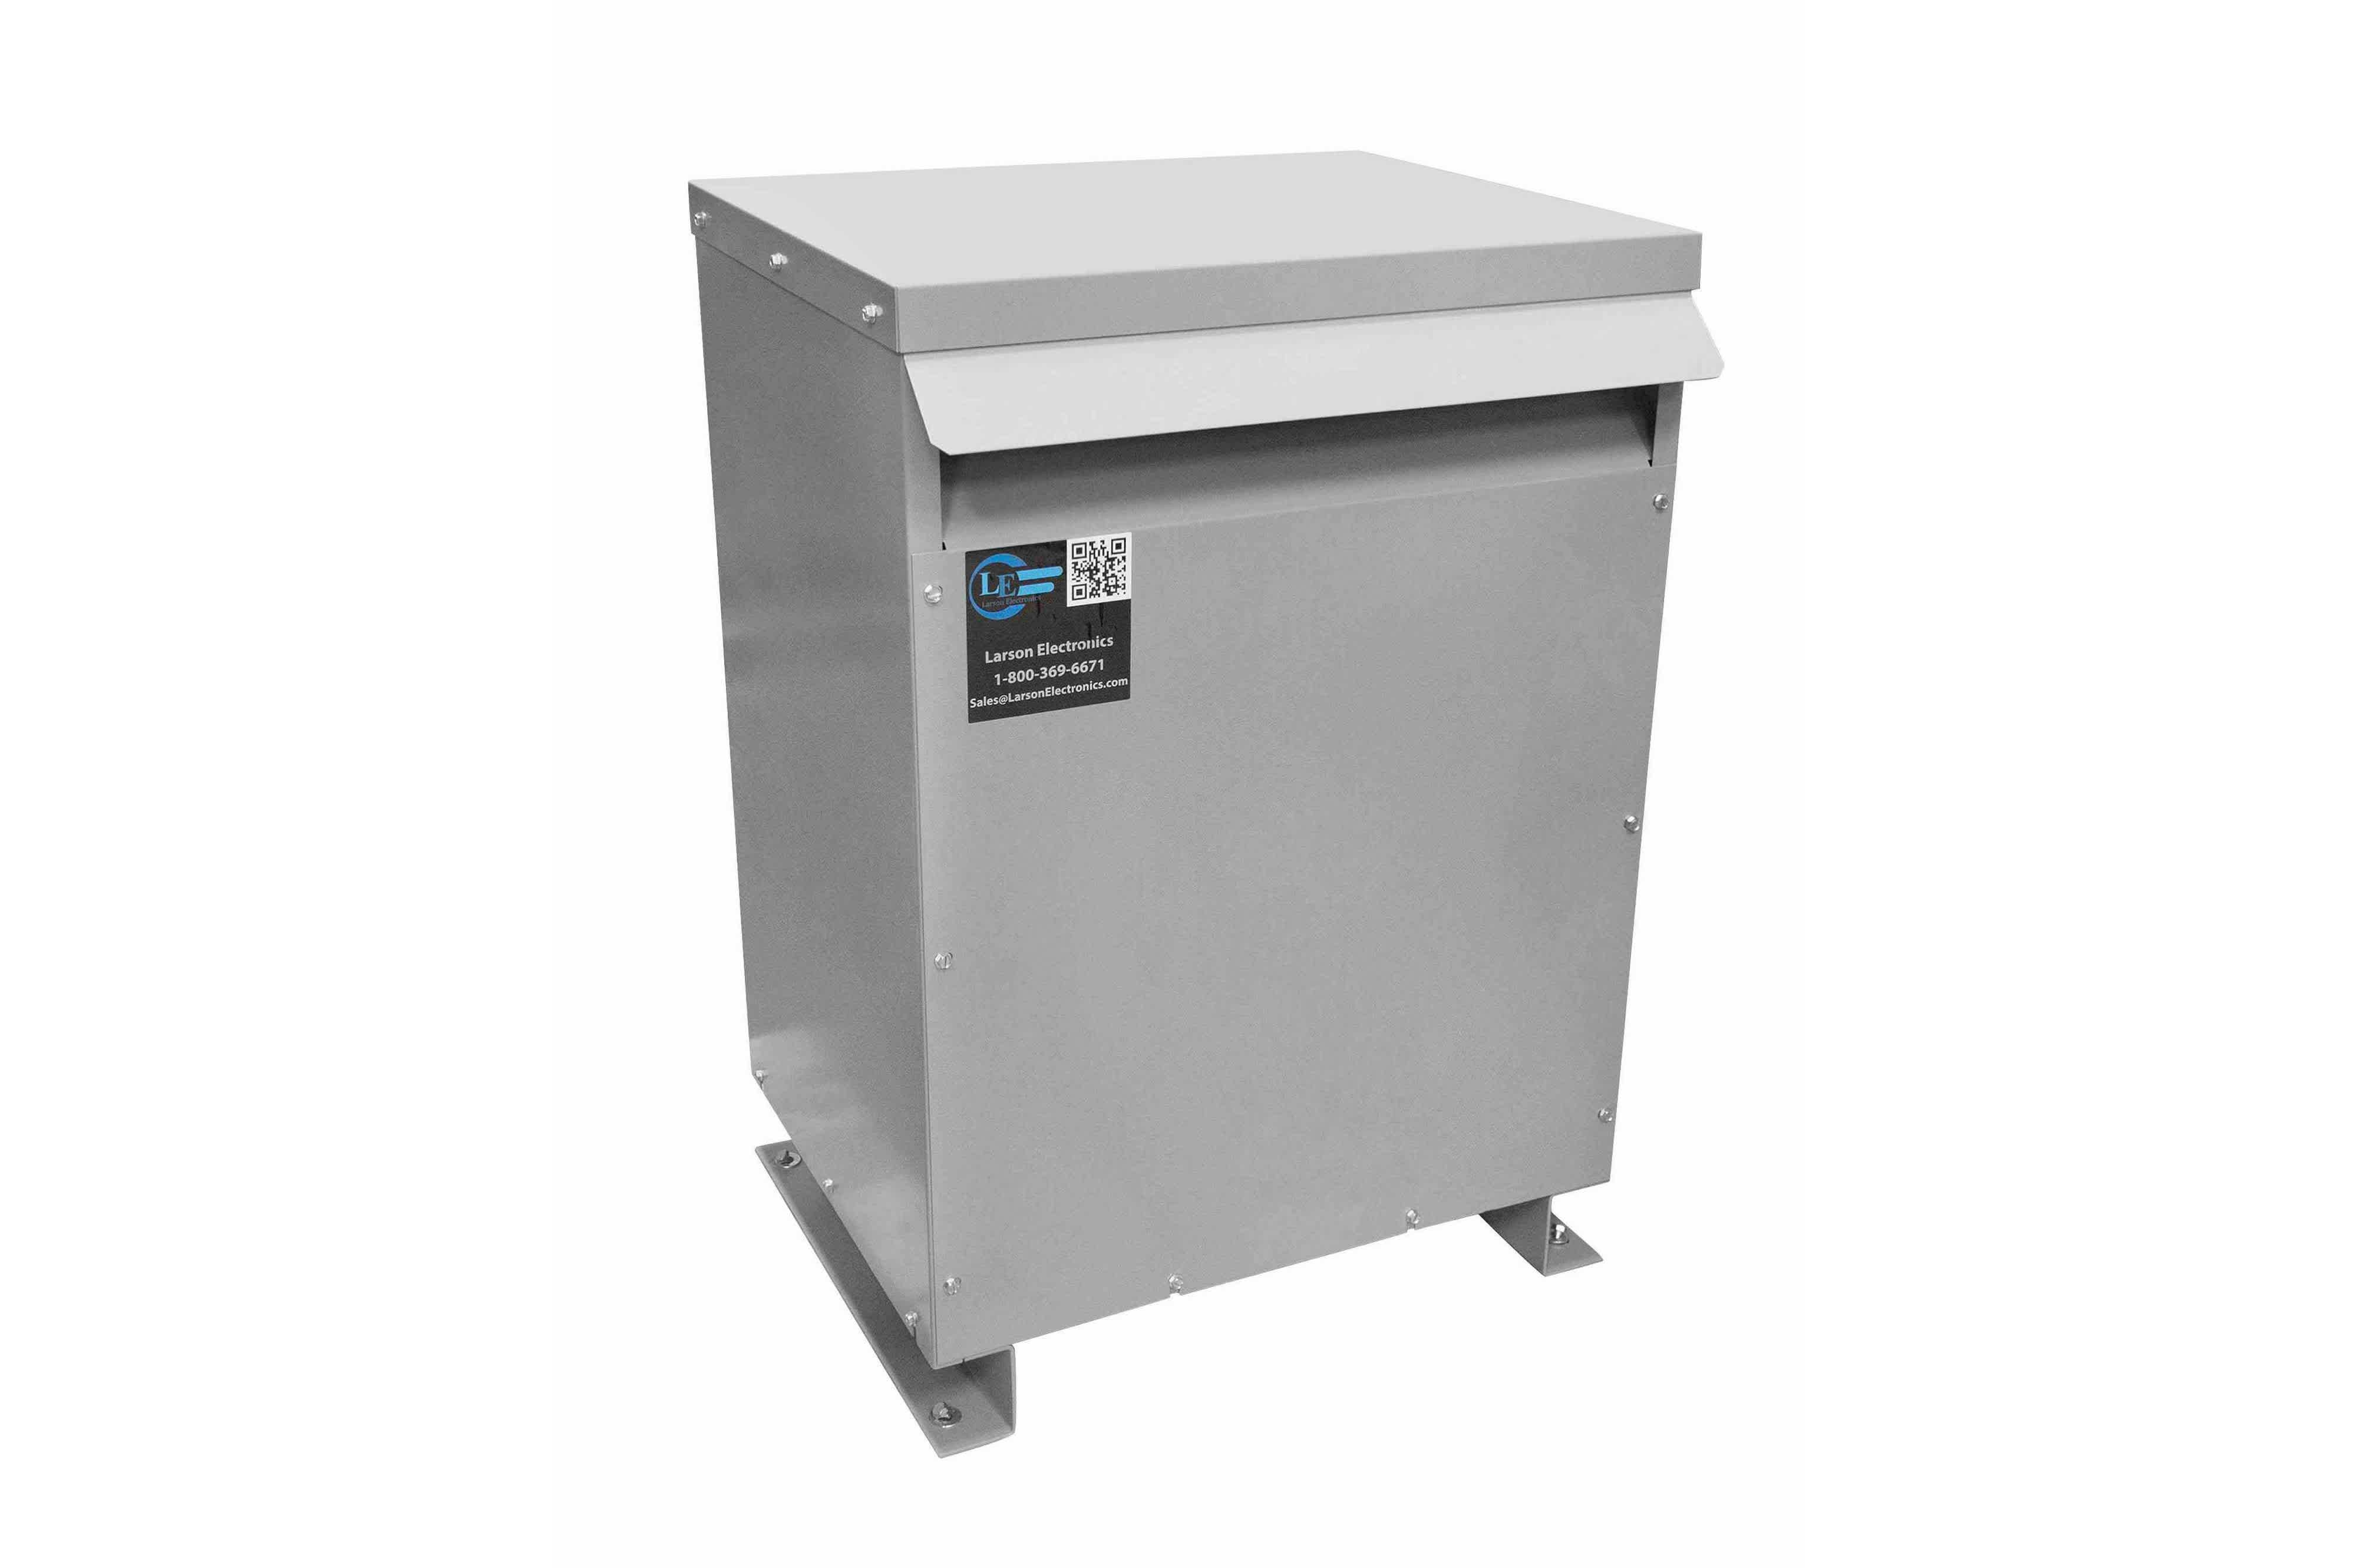 15 kVA 3PH Isolation Transformer, 480V Wye Primary, 380V Delta Secondary, N3R, Ventilated, 60 Hz